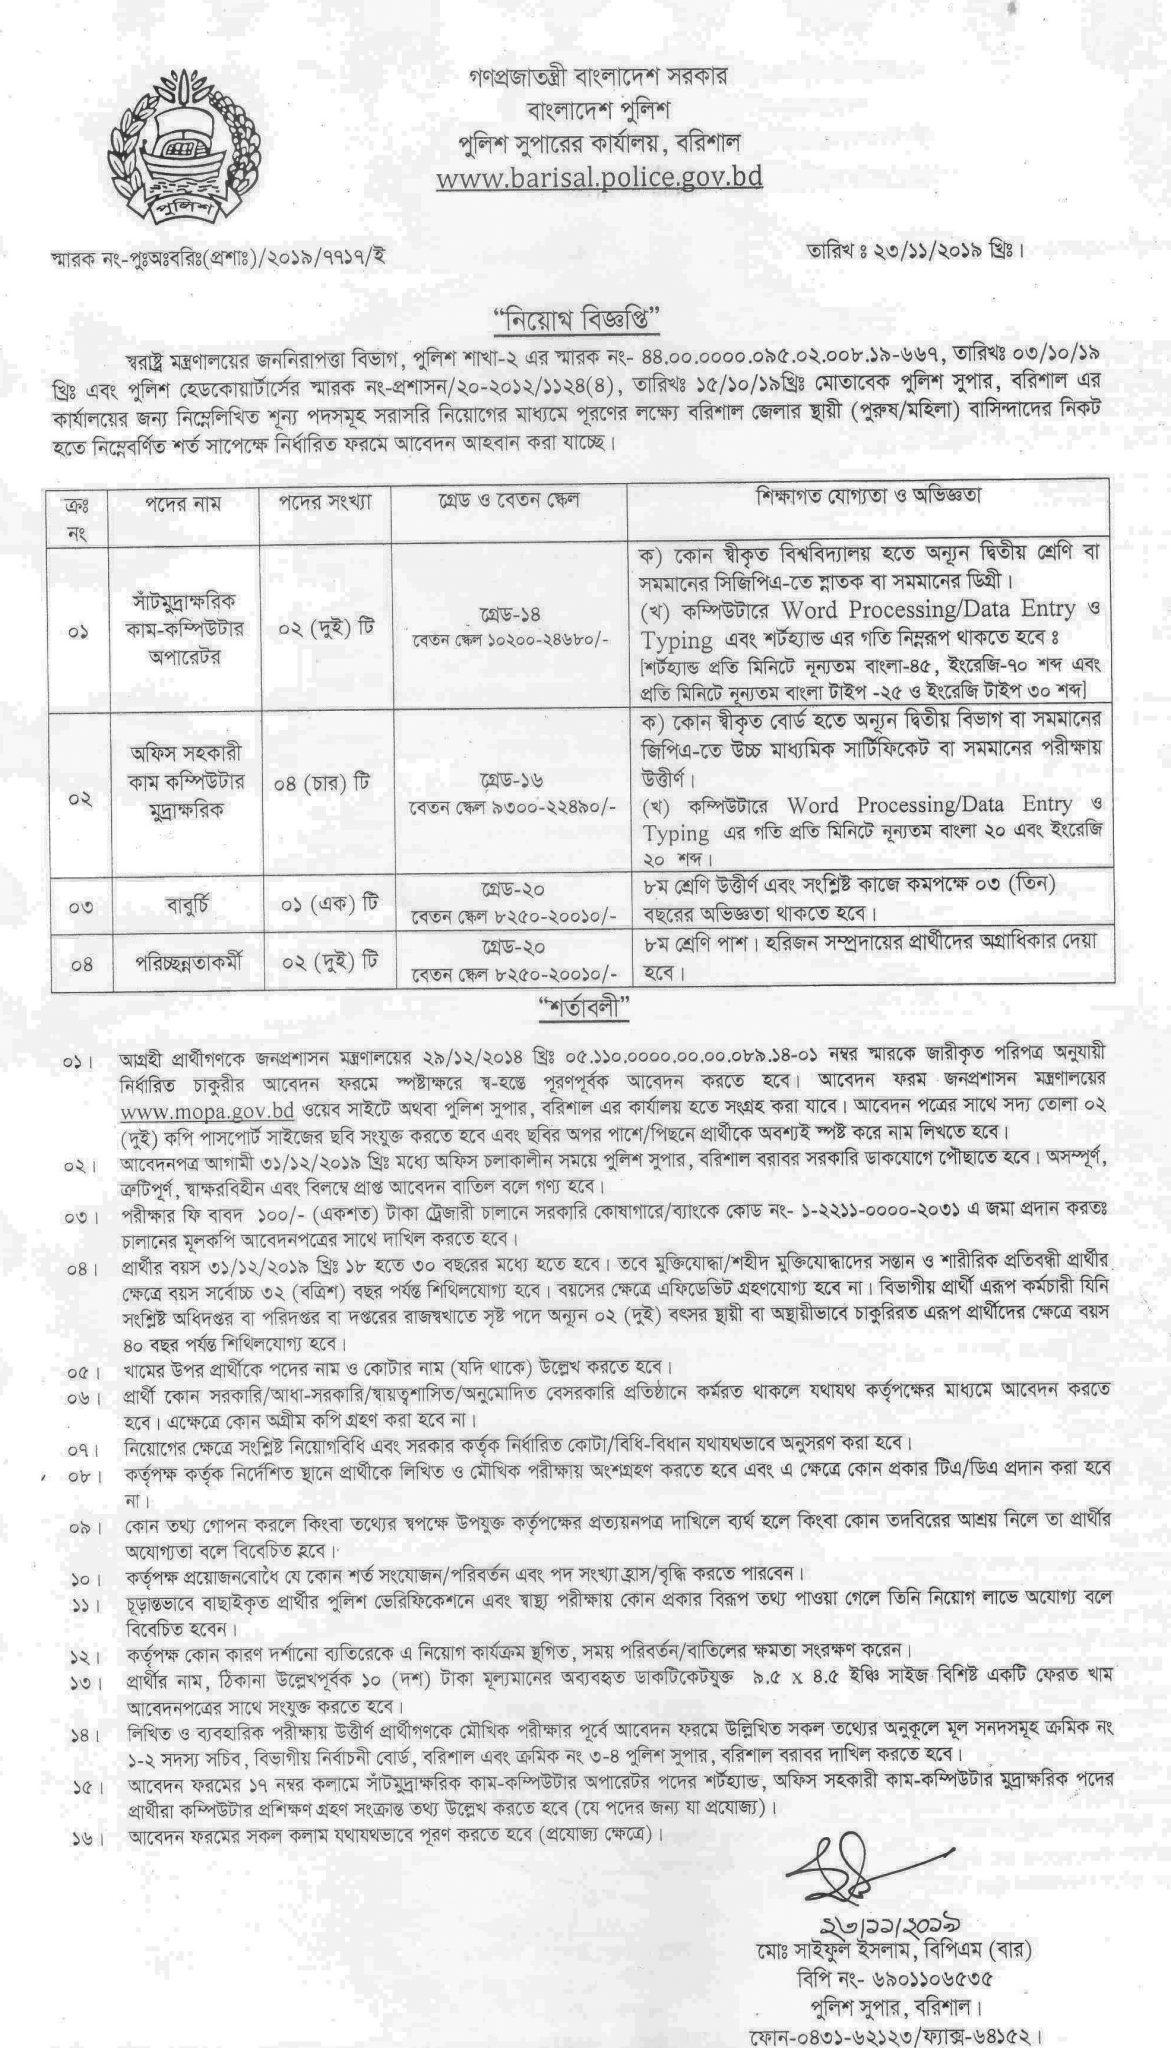 Bangladesh Police Job Circular 2019 | BD Govt Jobs 2019